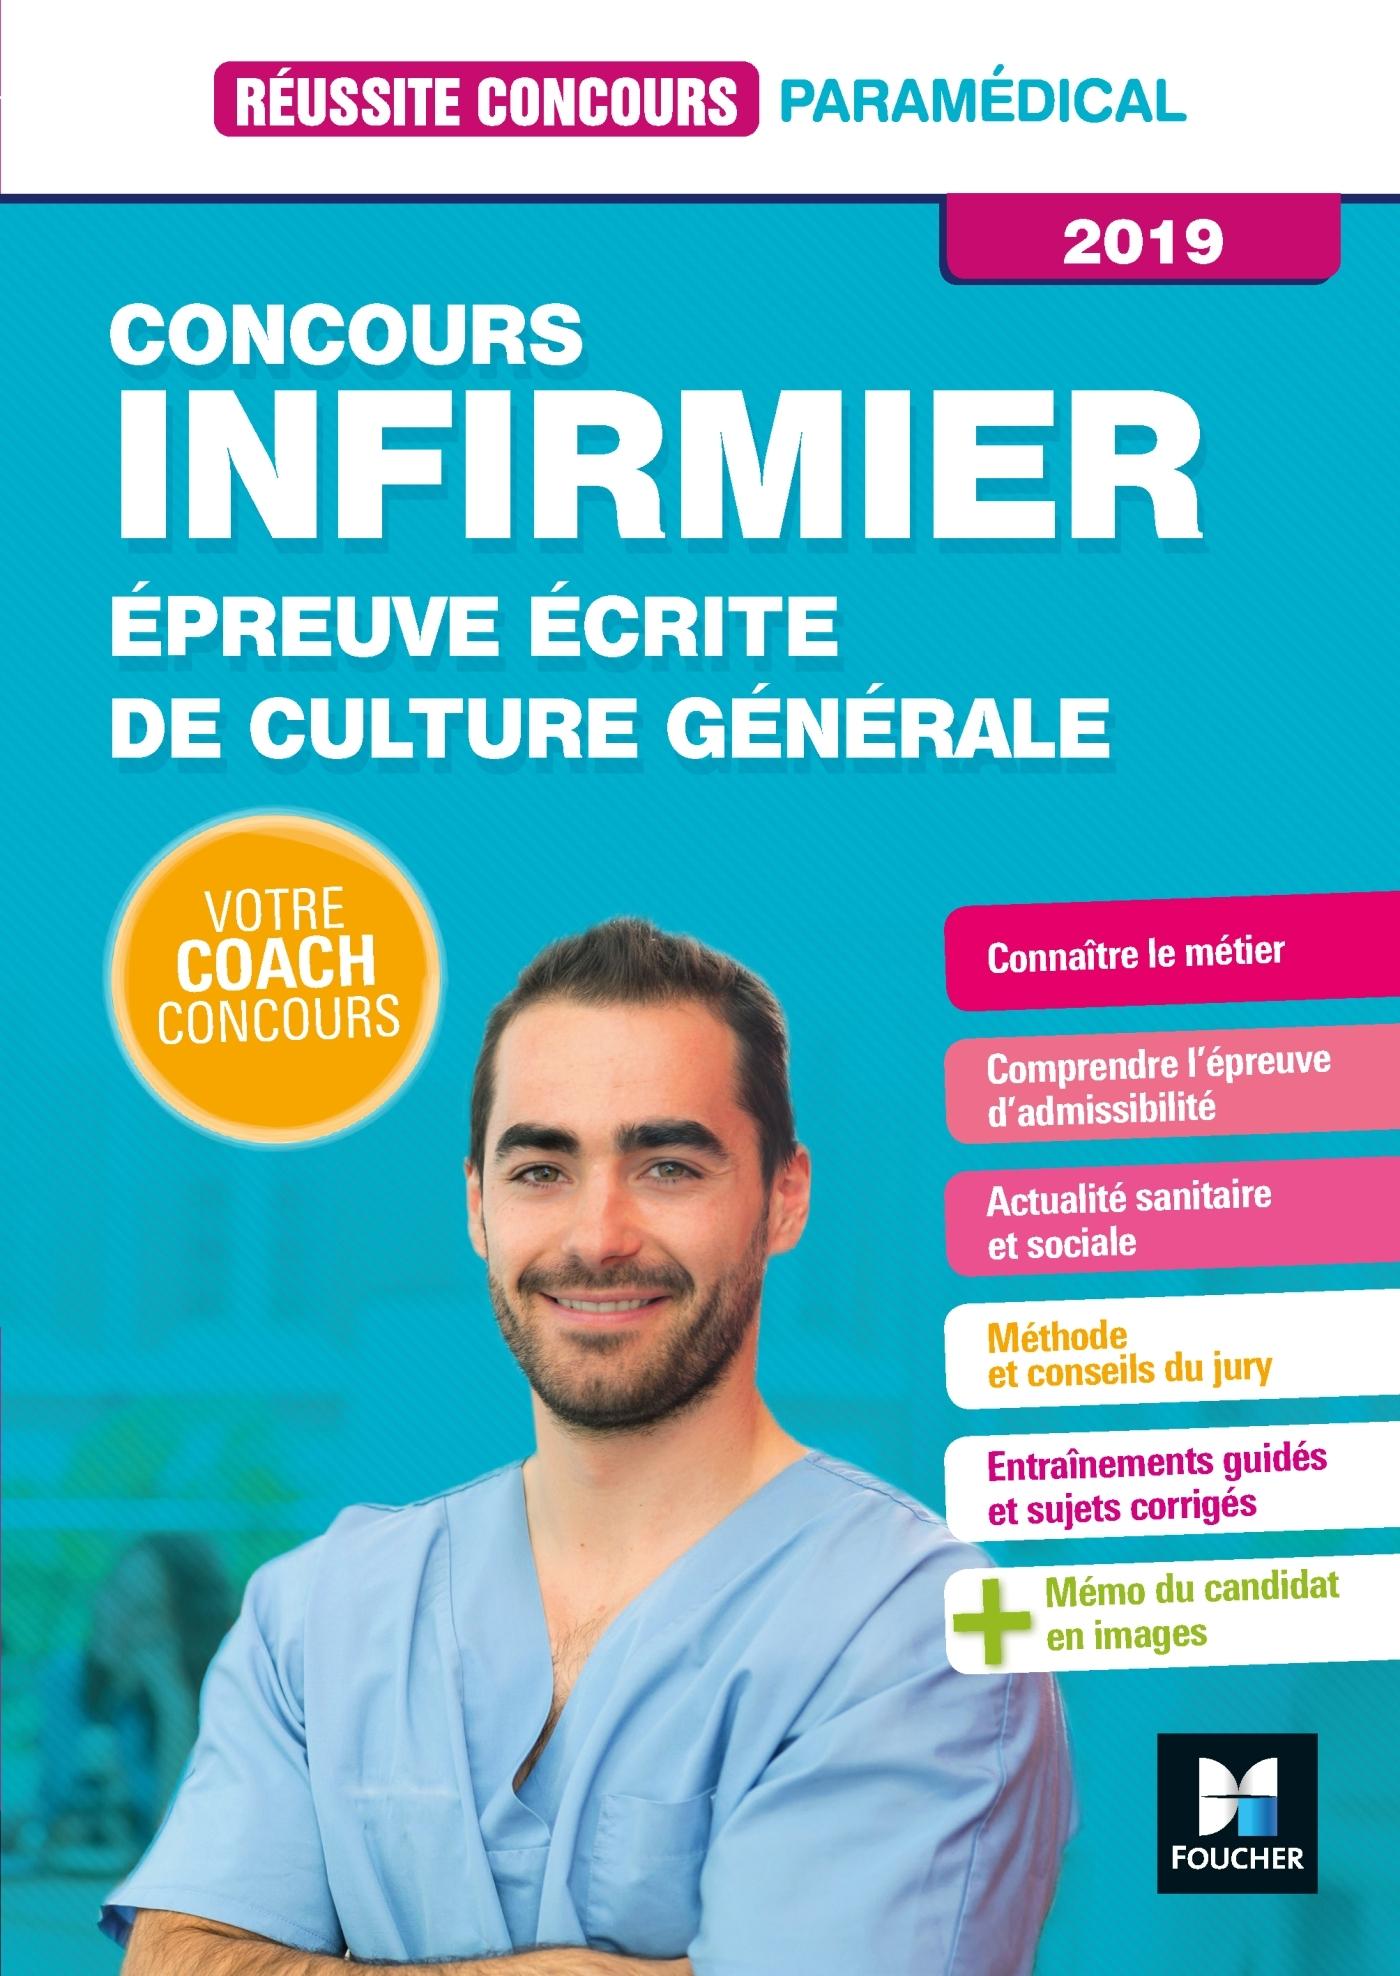 REUSSITE CONCOURS - IFSI EPREUVE ECRITE DE CULTURE GENERALE - 2019  - PREPARATION EPREUVE COMPLETE